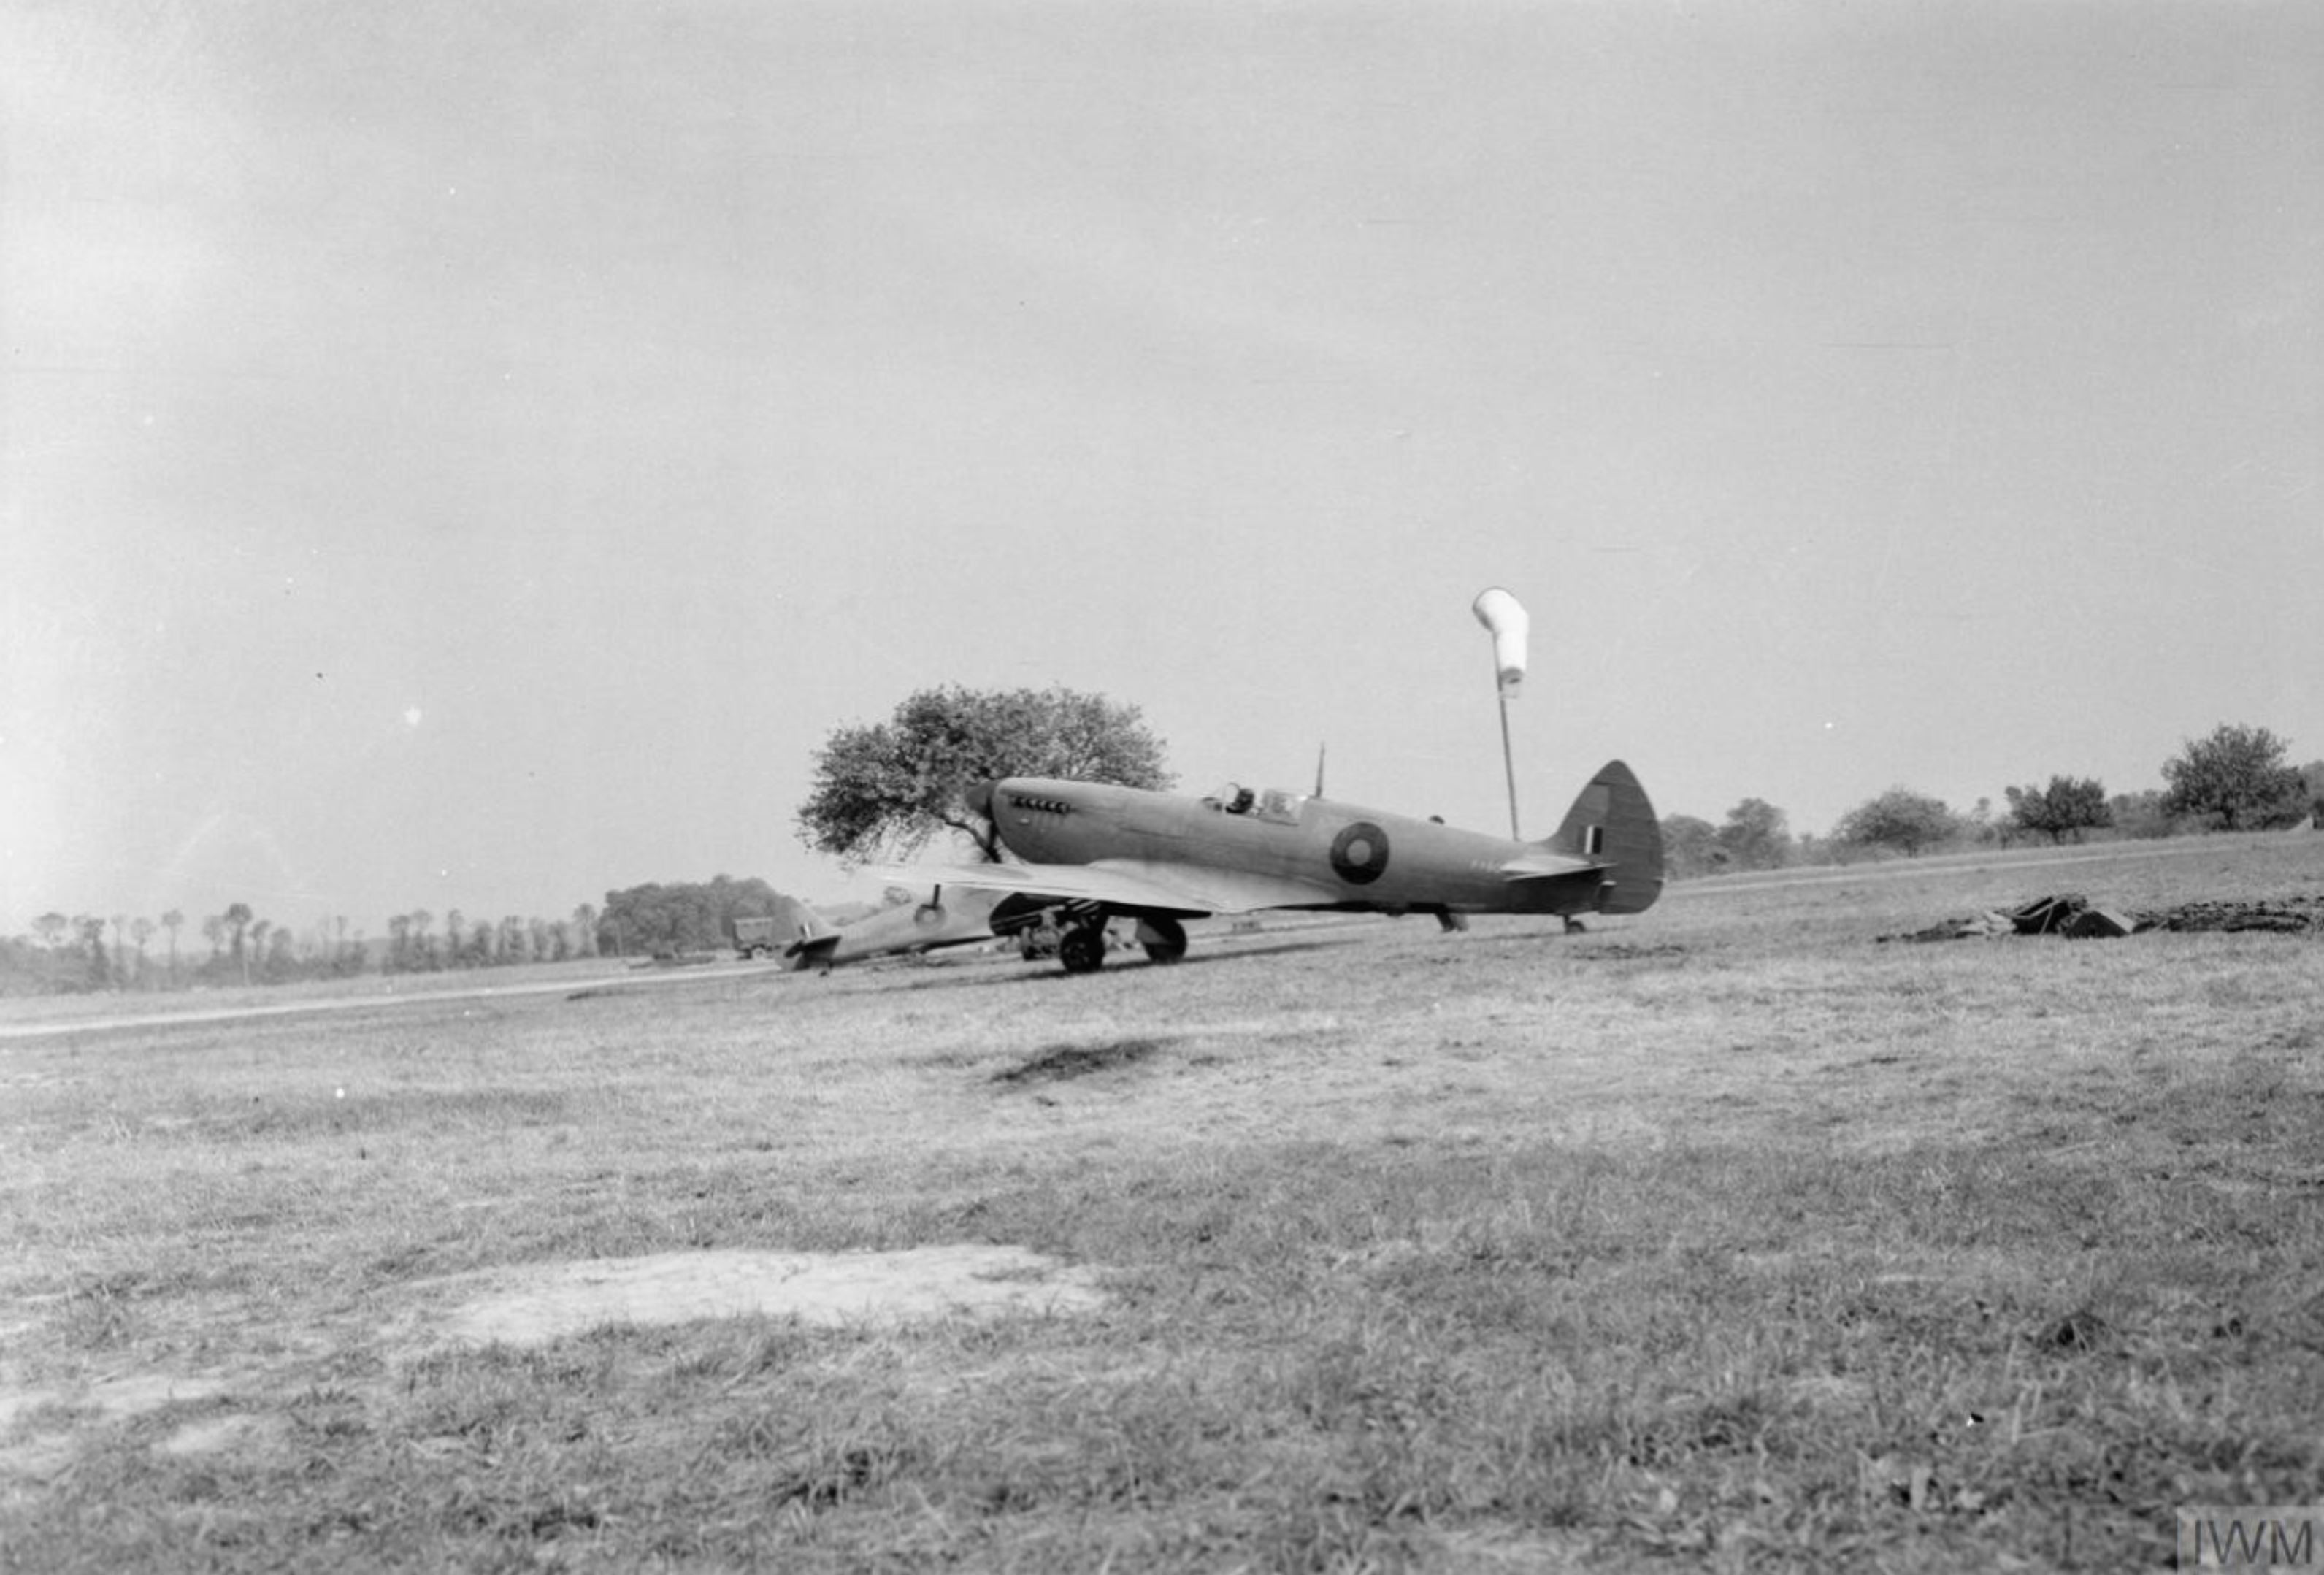 Spitfire MkIXs RCAF 400Sqn at B21 Ste Honorine de Ducy Normandy 1944 IWM CL826